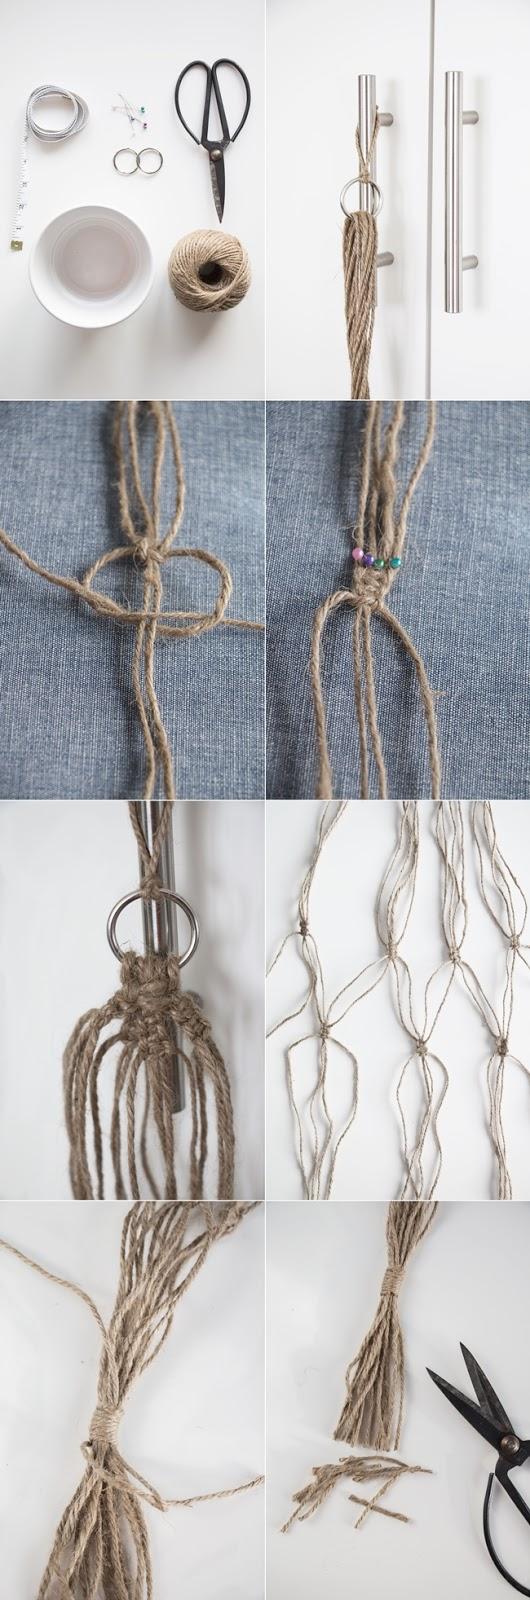 plant hanger, macrame, ampel macrame, diy plant hanger, diy ampel, knyta ampel, göra själv ampel